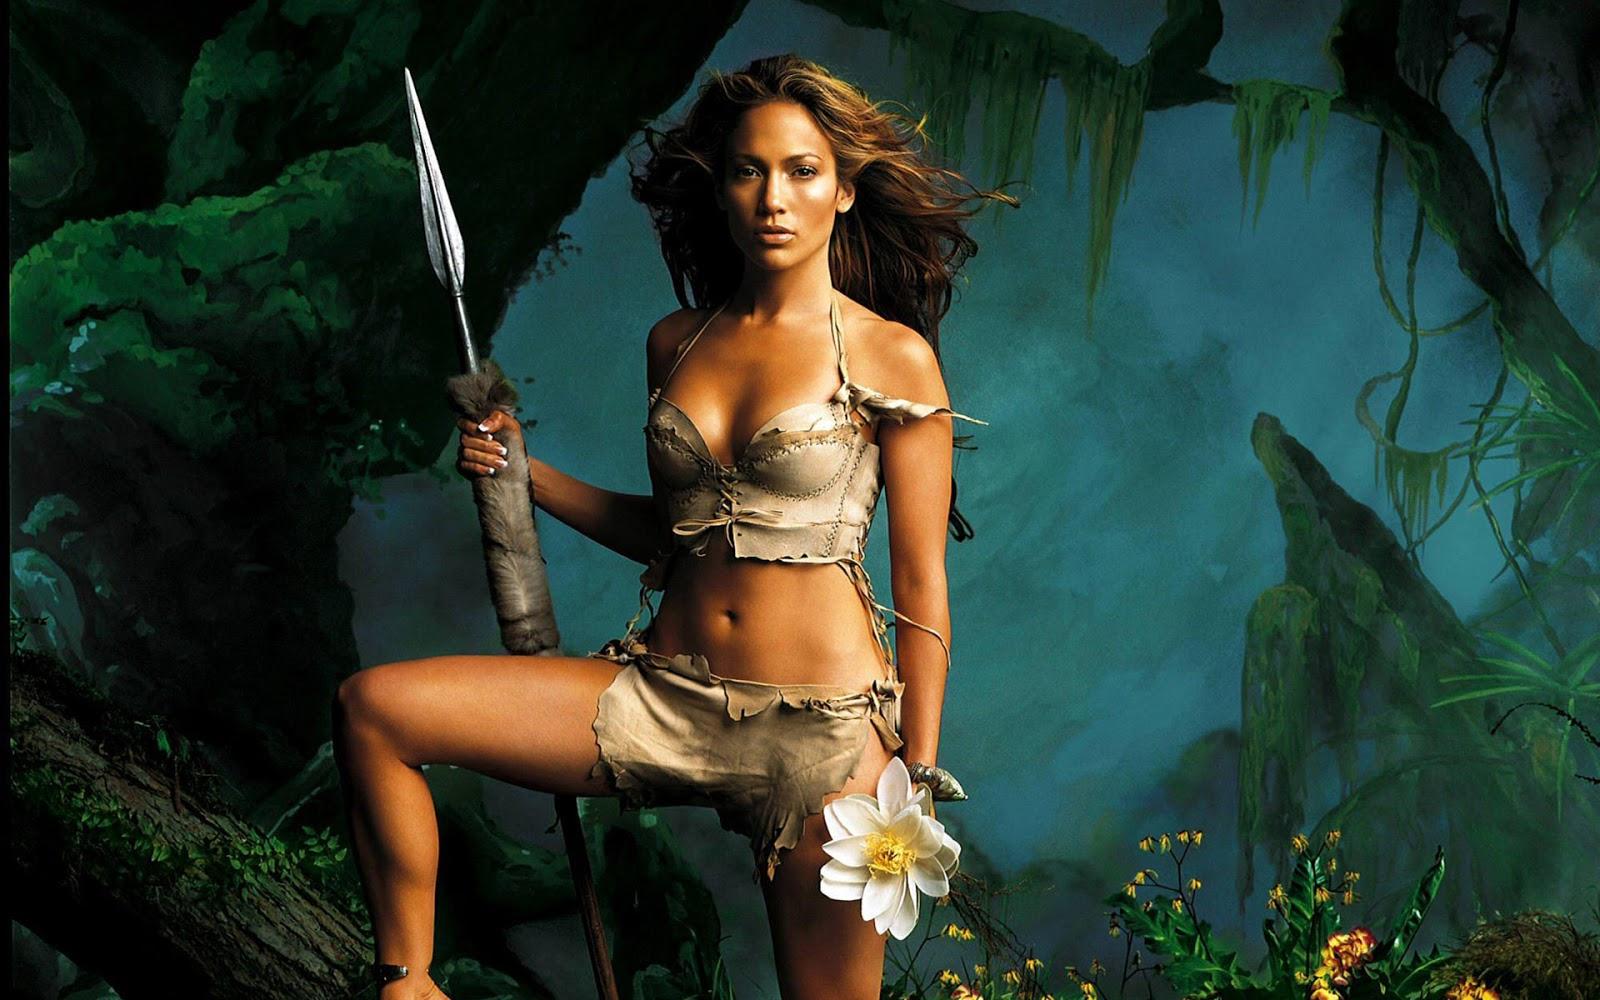 Amit Name Wallpaper Hd Jennifer Lopez Hot Hd Wallpapers 2013 Hollywood Universe